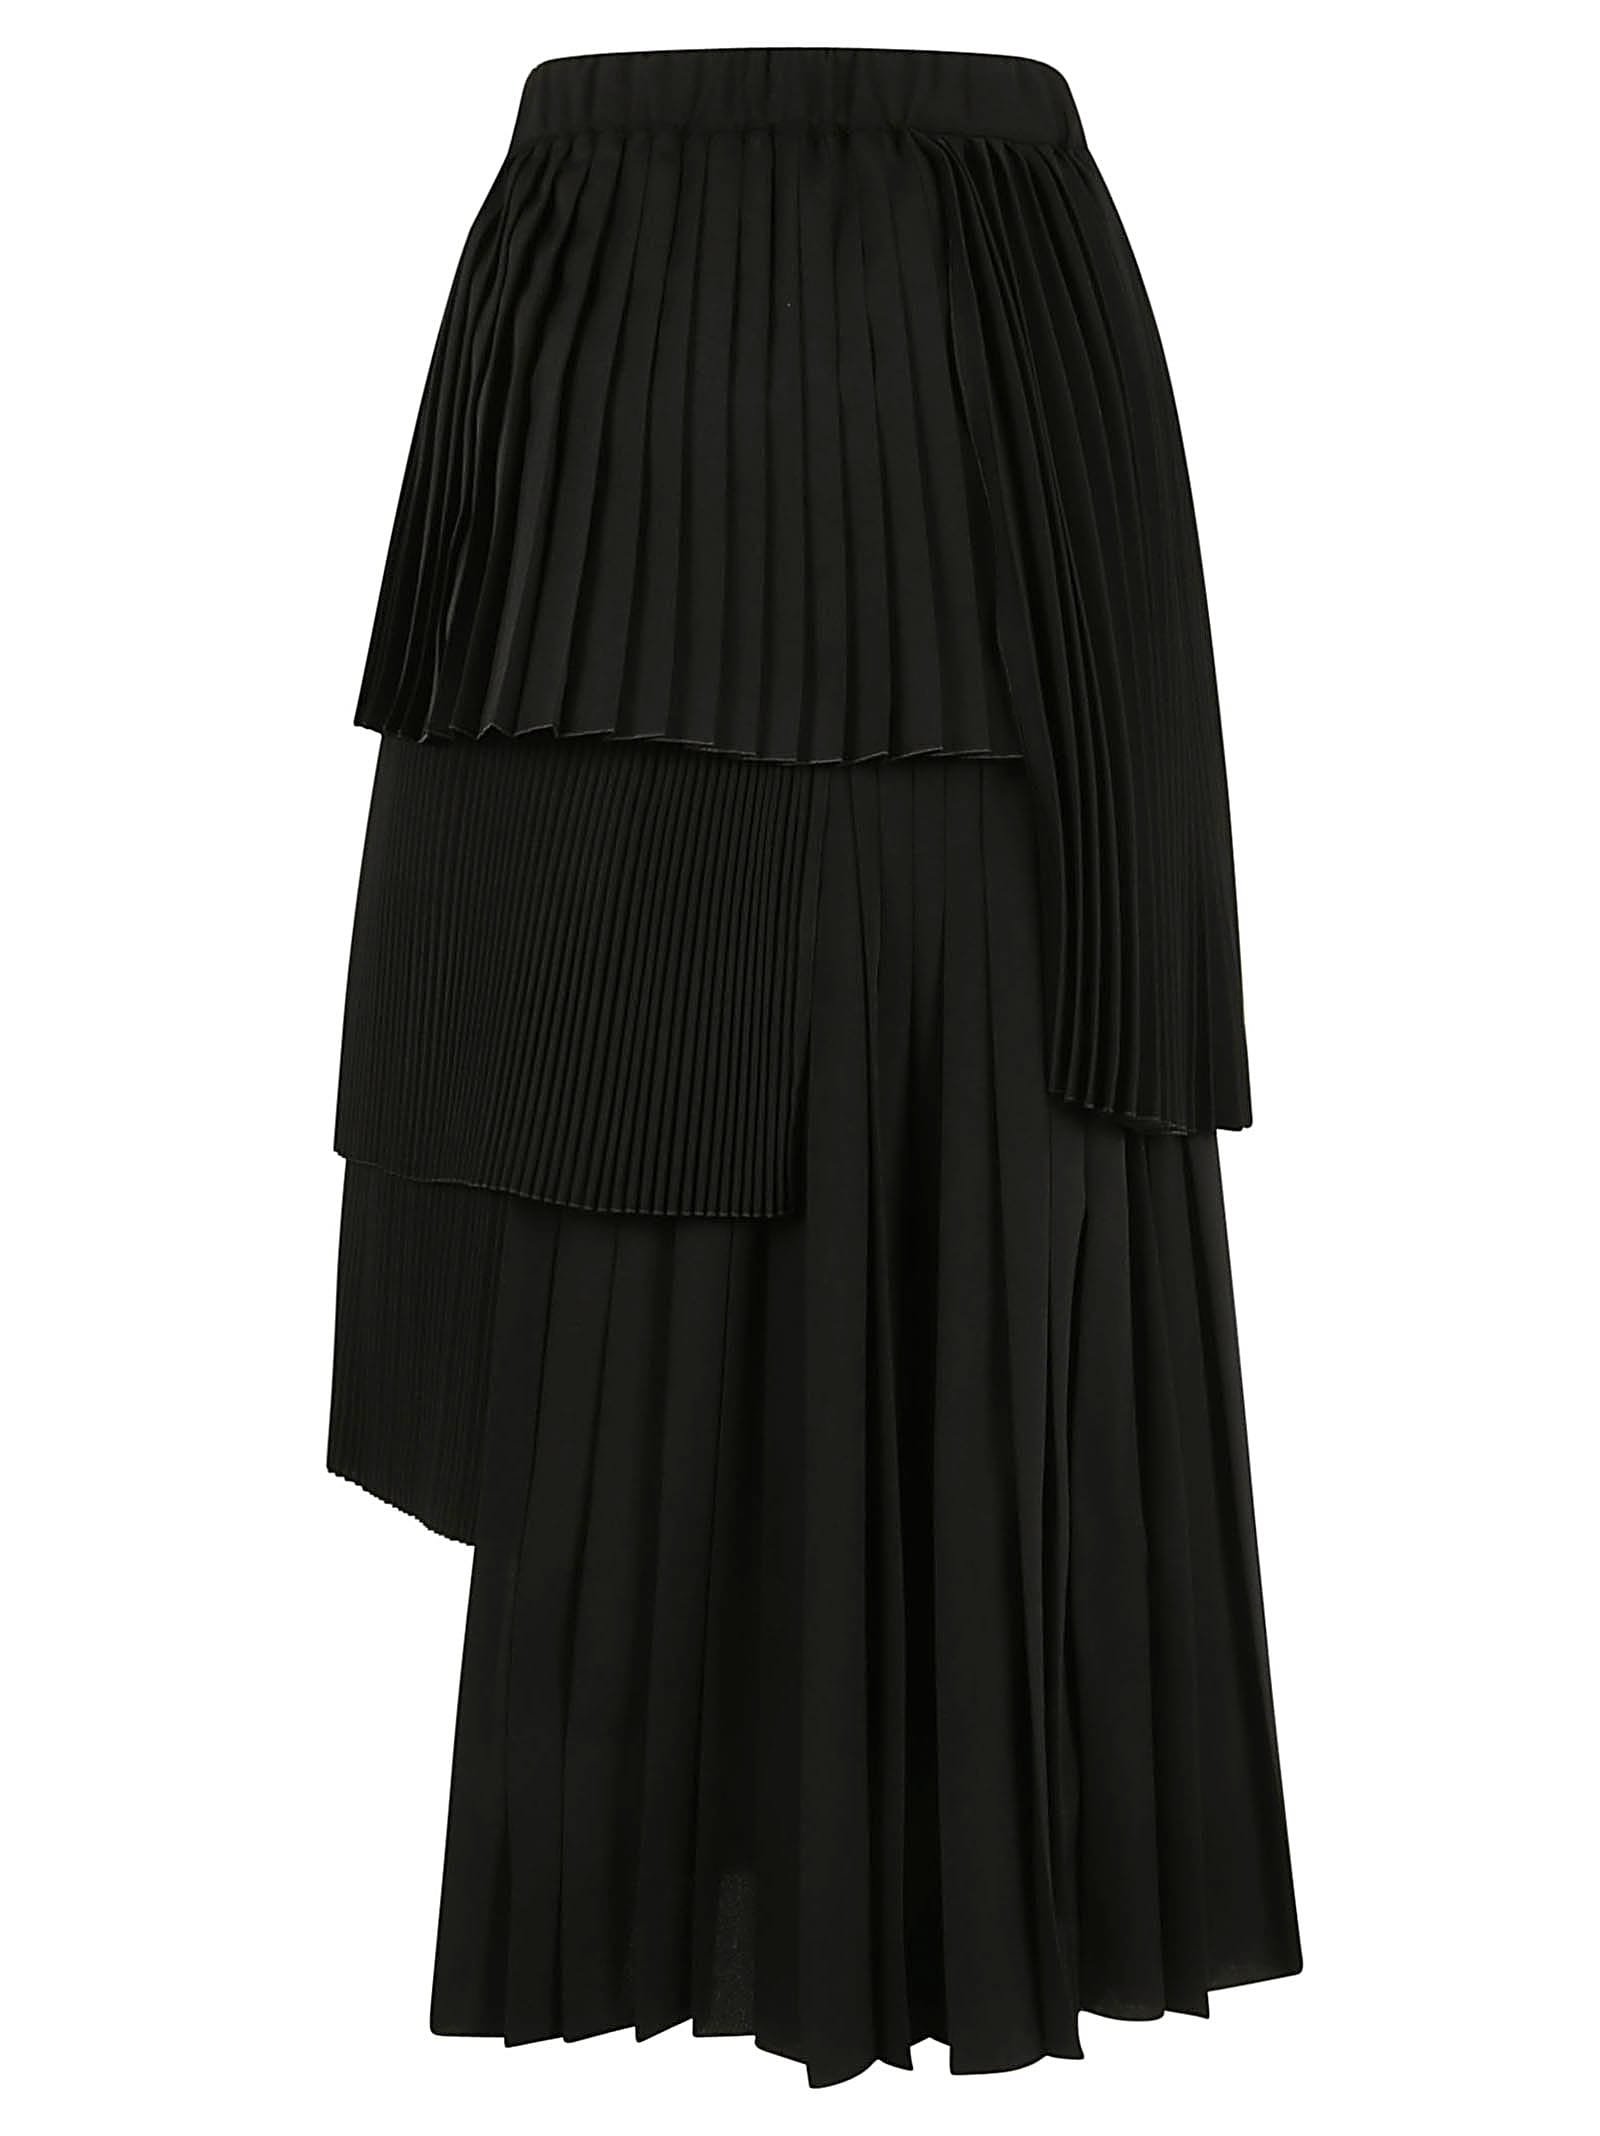 N.21 Pleated Layered Skirt